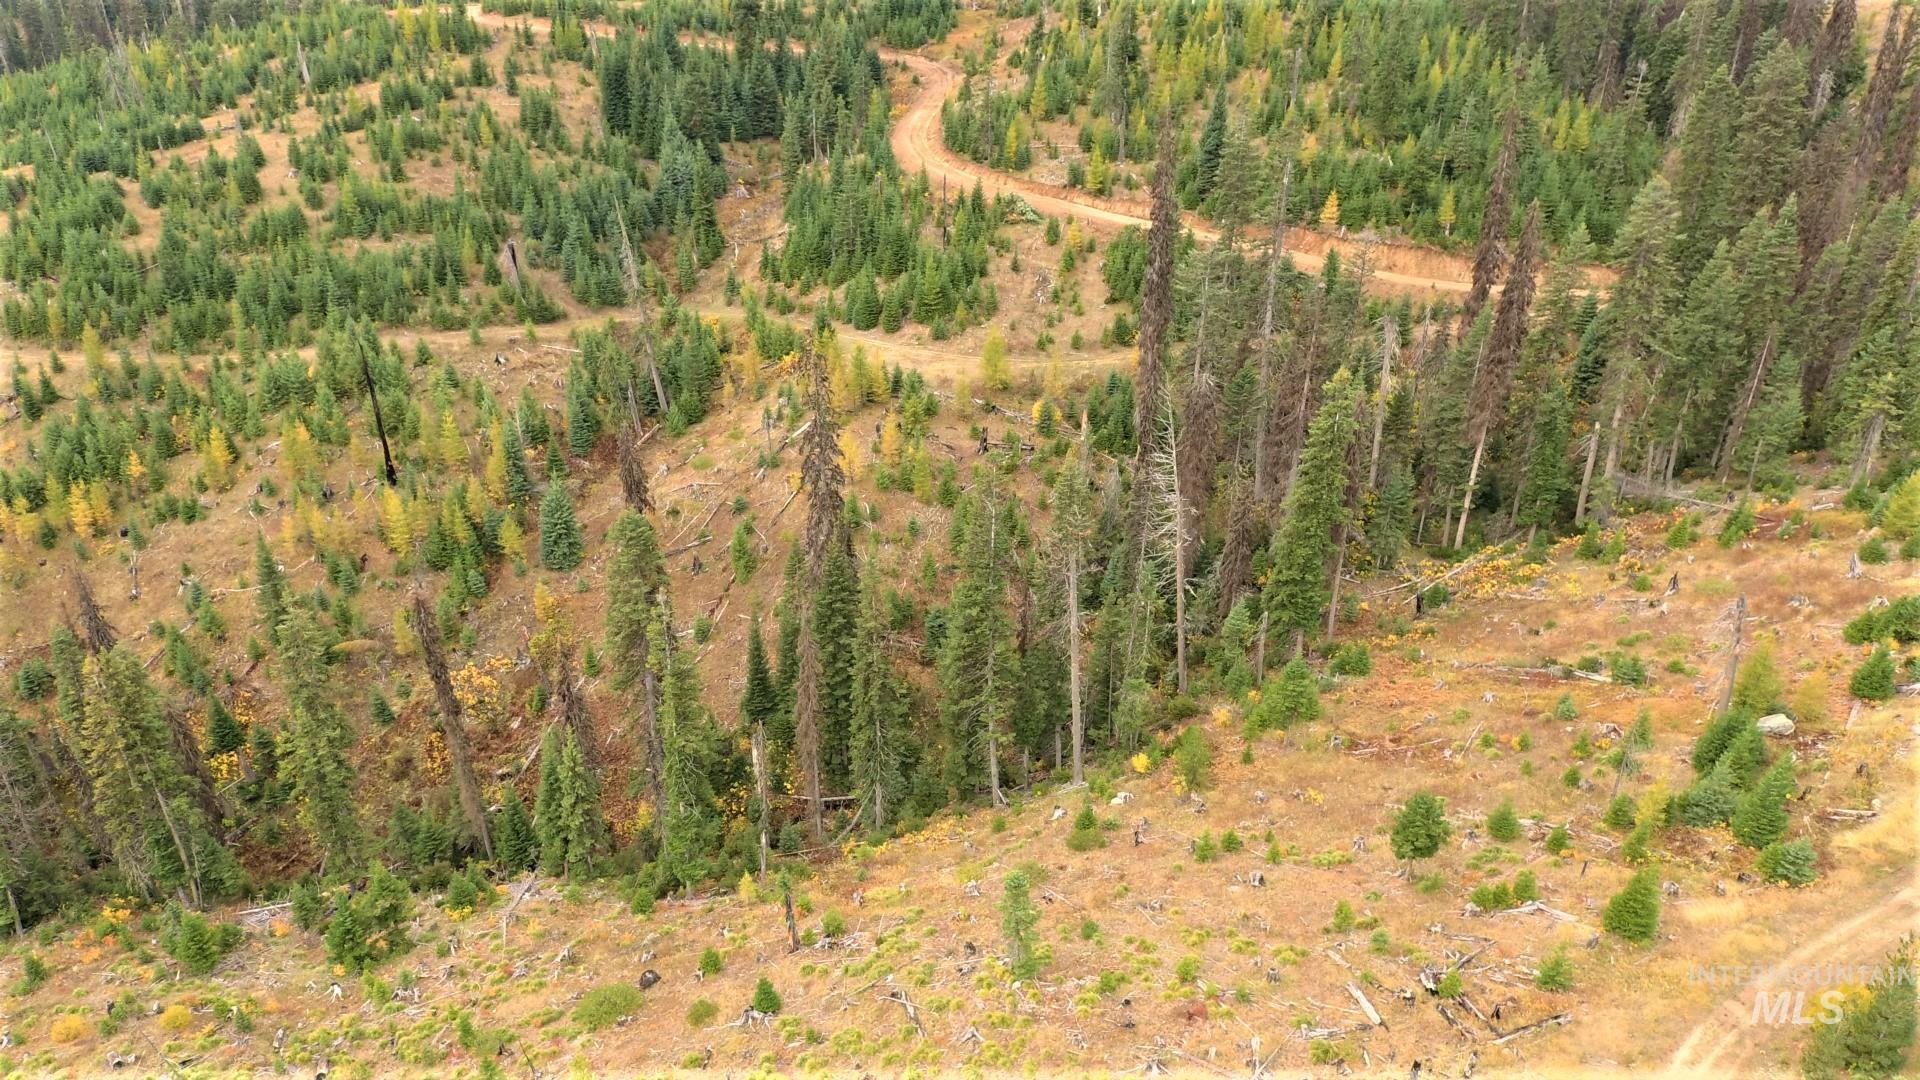 Tbd Elk Summit Properties Parcel 3 Property Photo